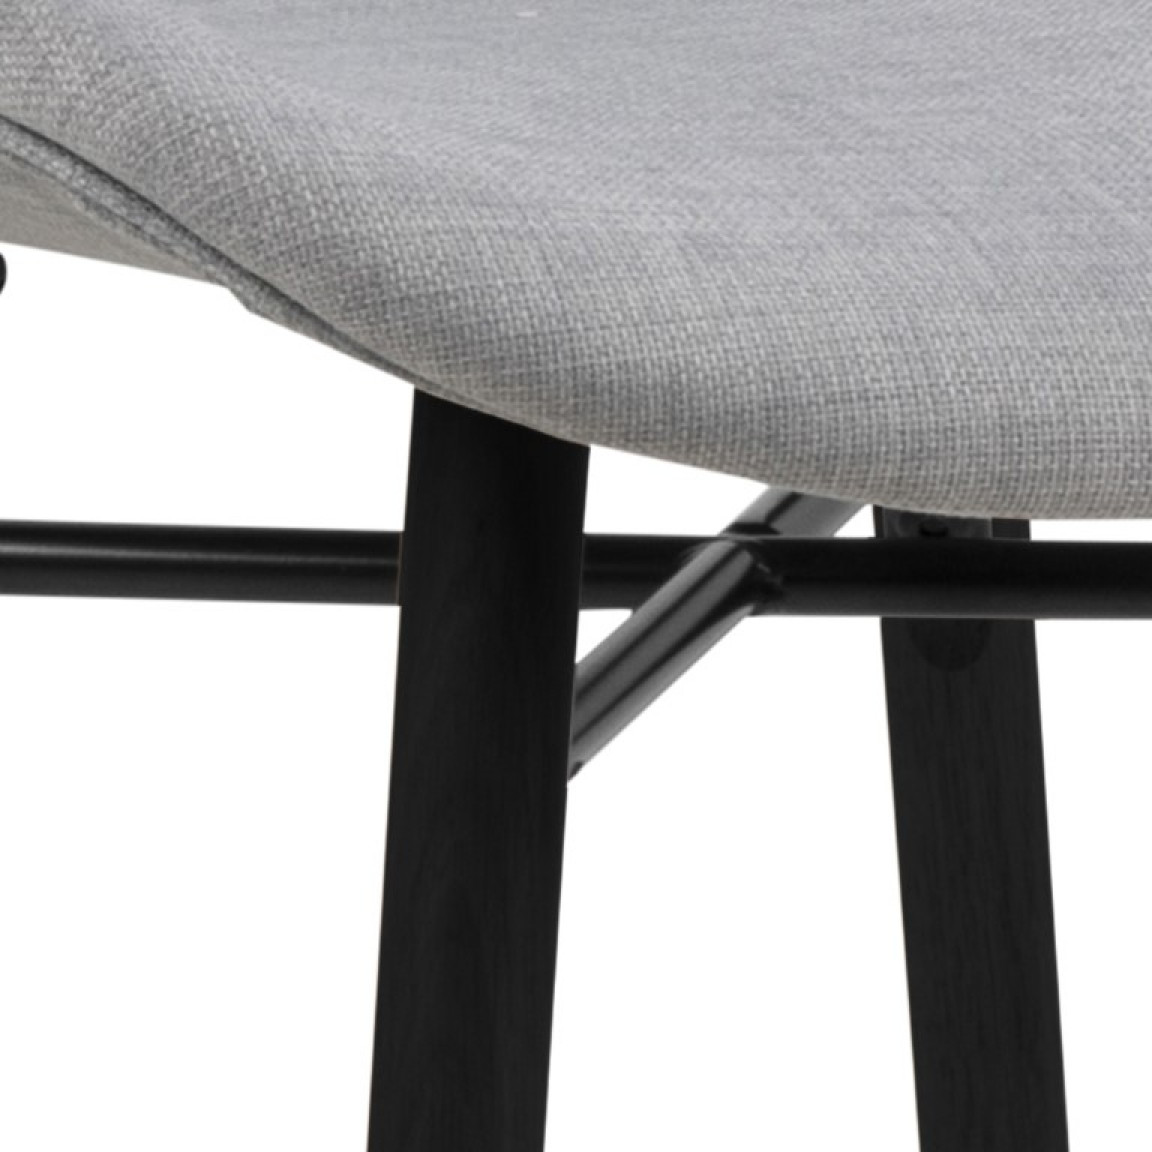 Set of 2 Chairs Matilda-A1   Light Grey & Black